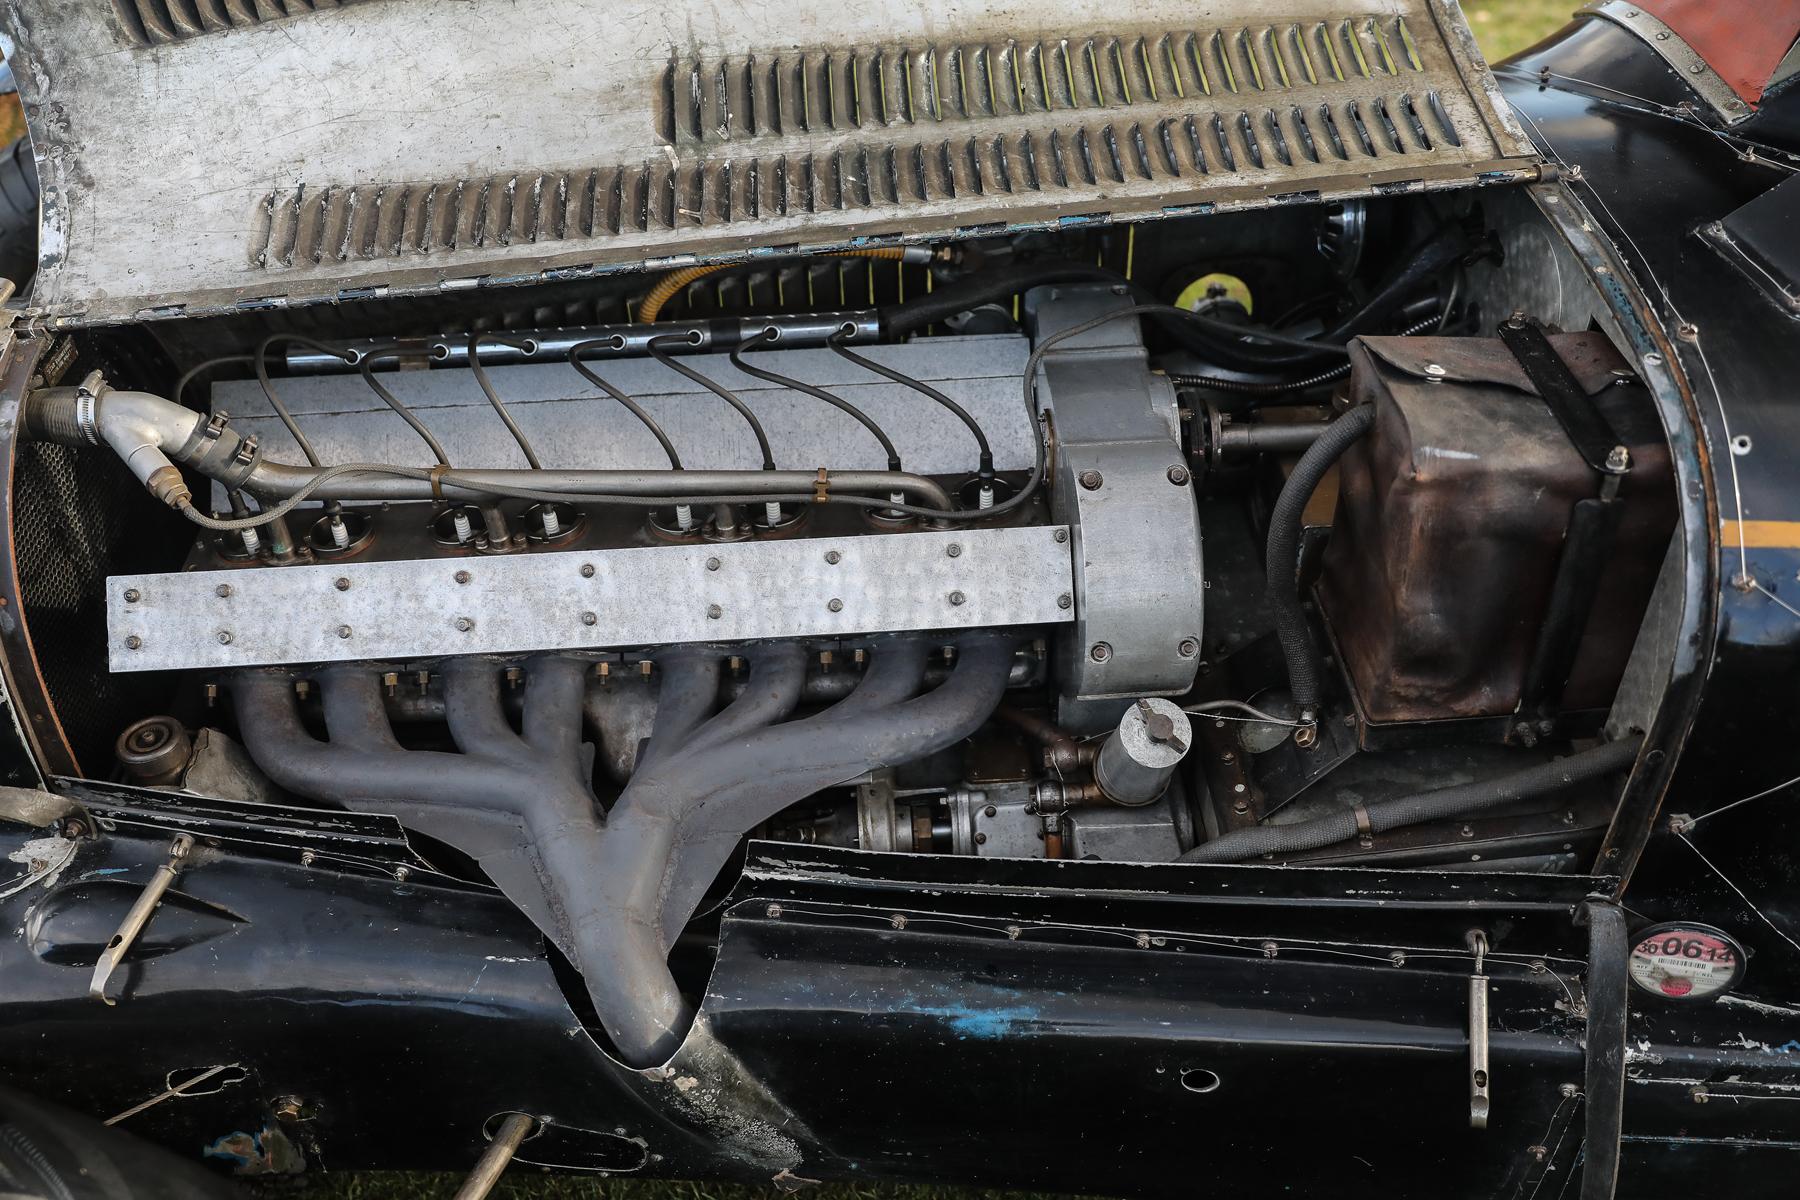 1934 Bugatti Type 59 Sports engine